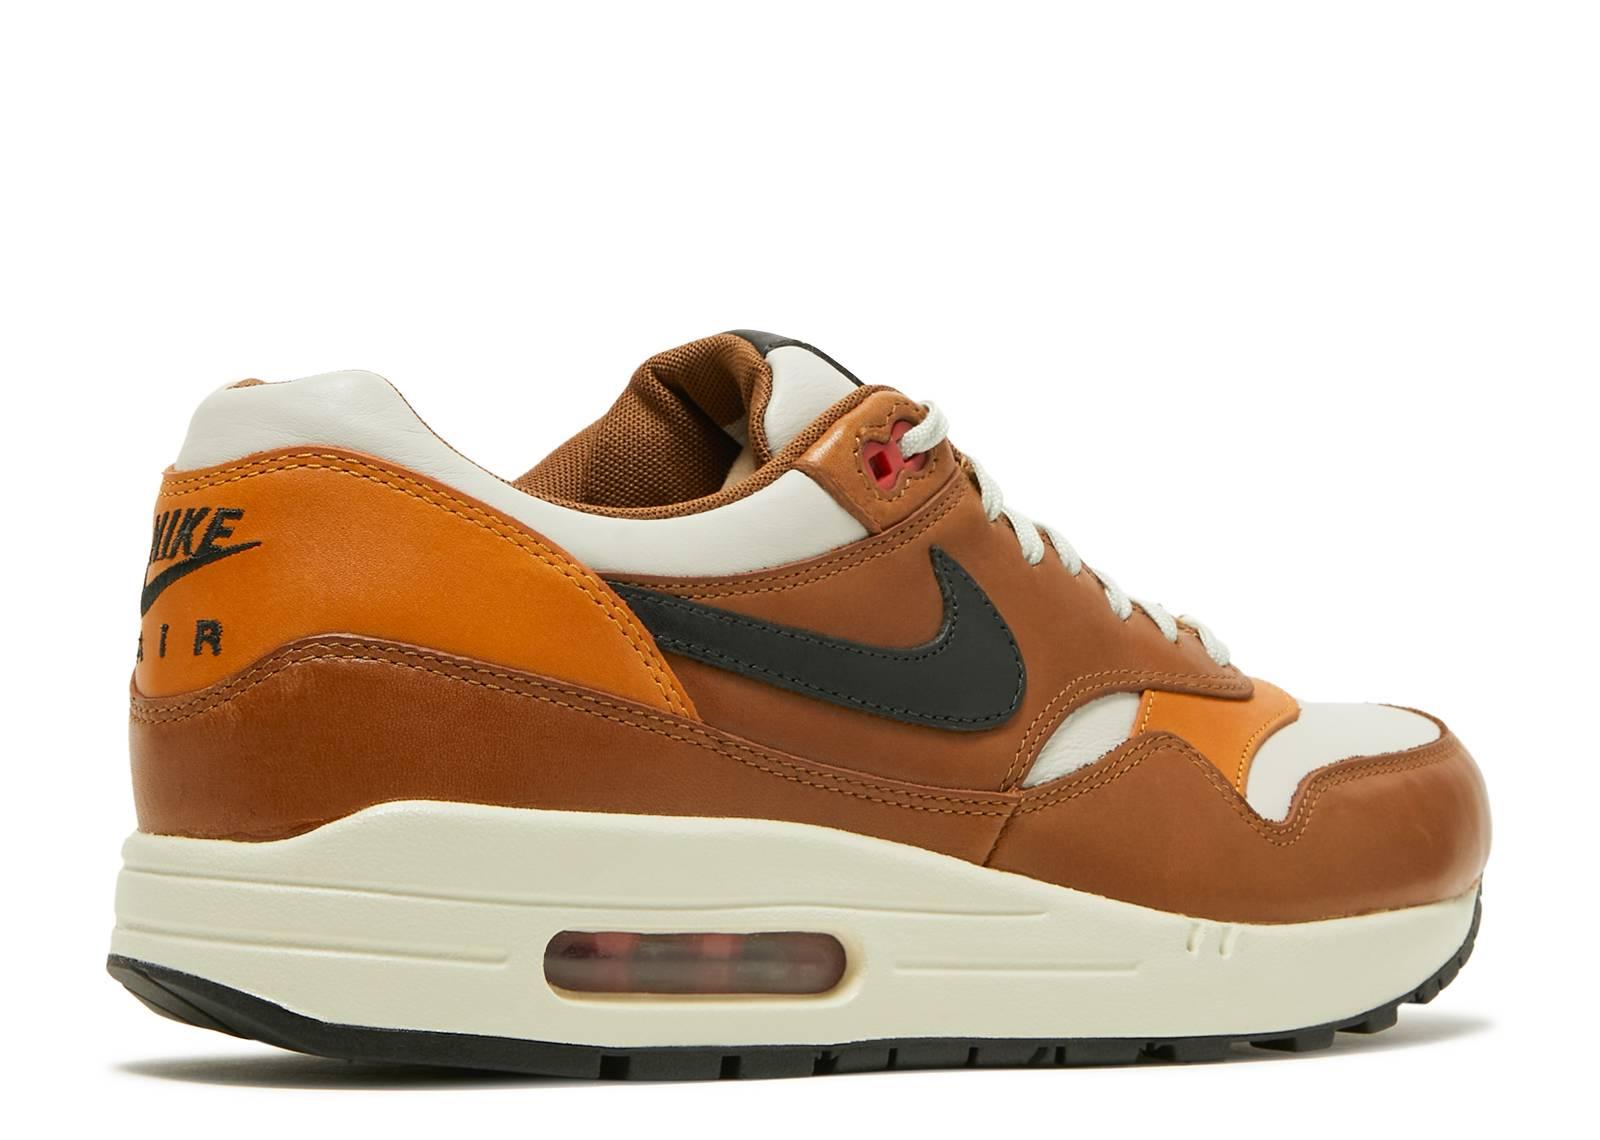 Nike Air Max 1 Escape QS 718302 002 Sneakersnstuff